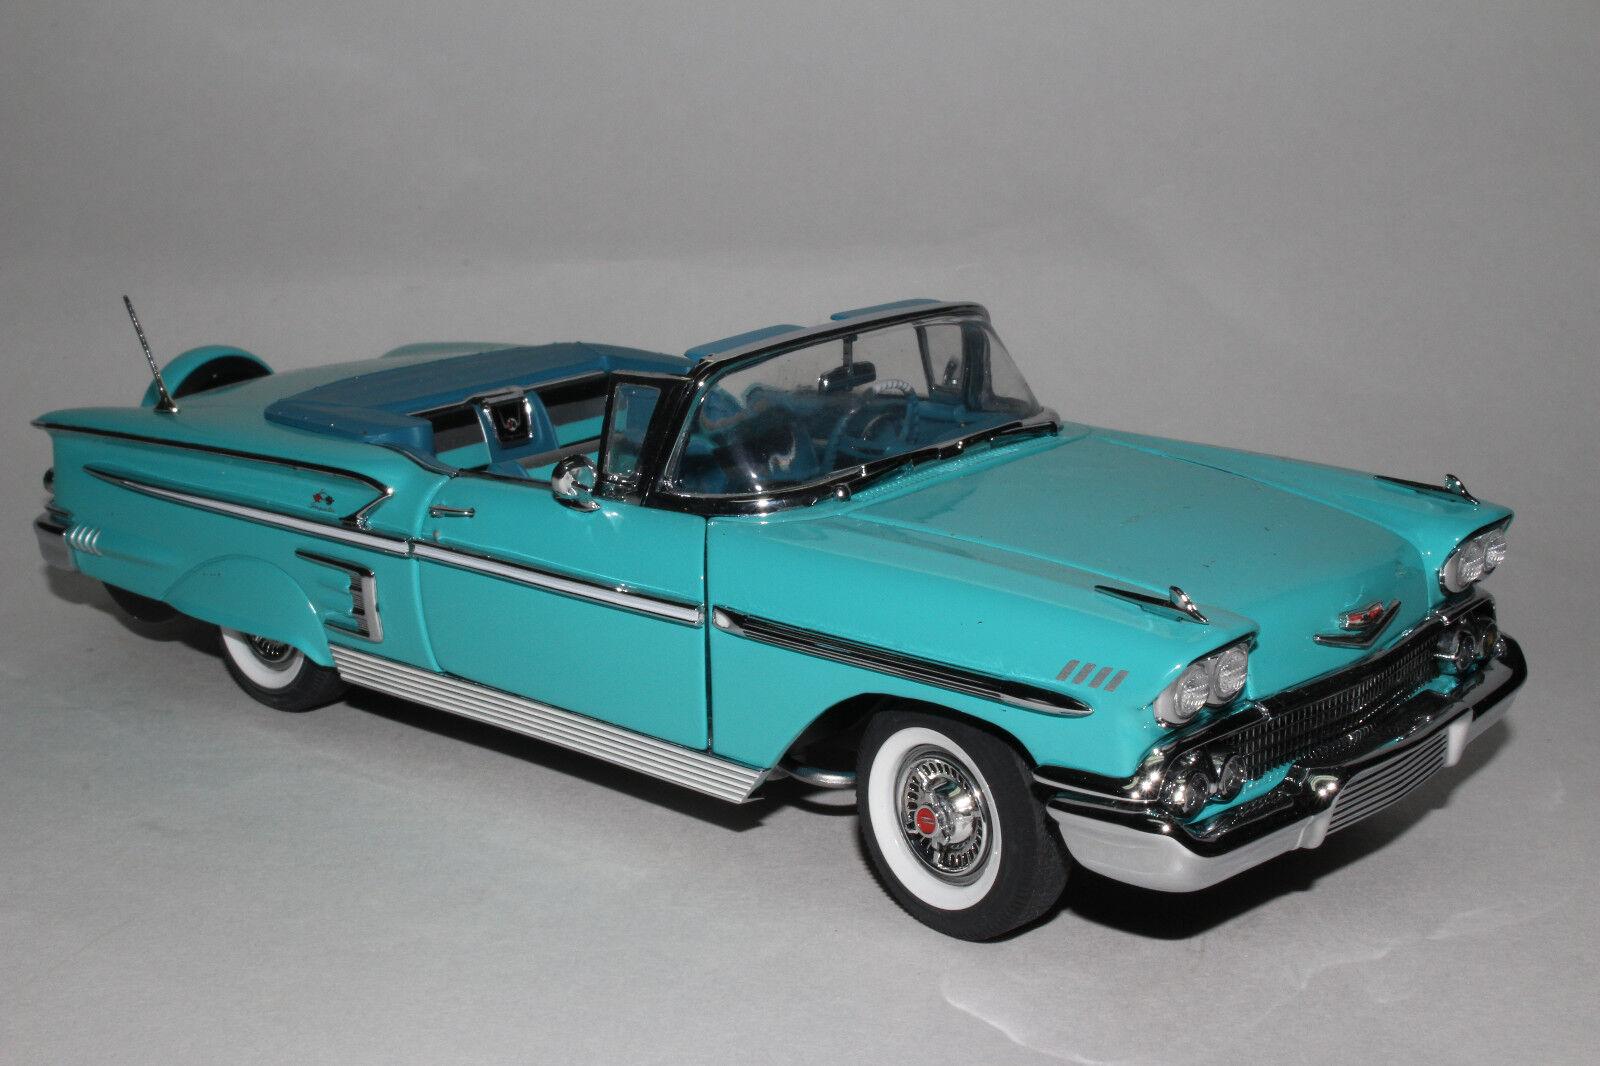 Danbury Mint 1958 Chevrolet Impala Impala Impala Congreenible, 1 24 Scale Die Cast Model c3caad